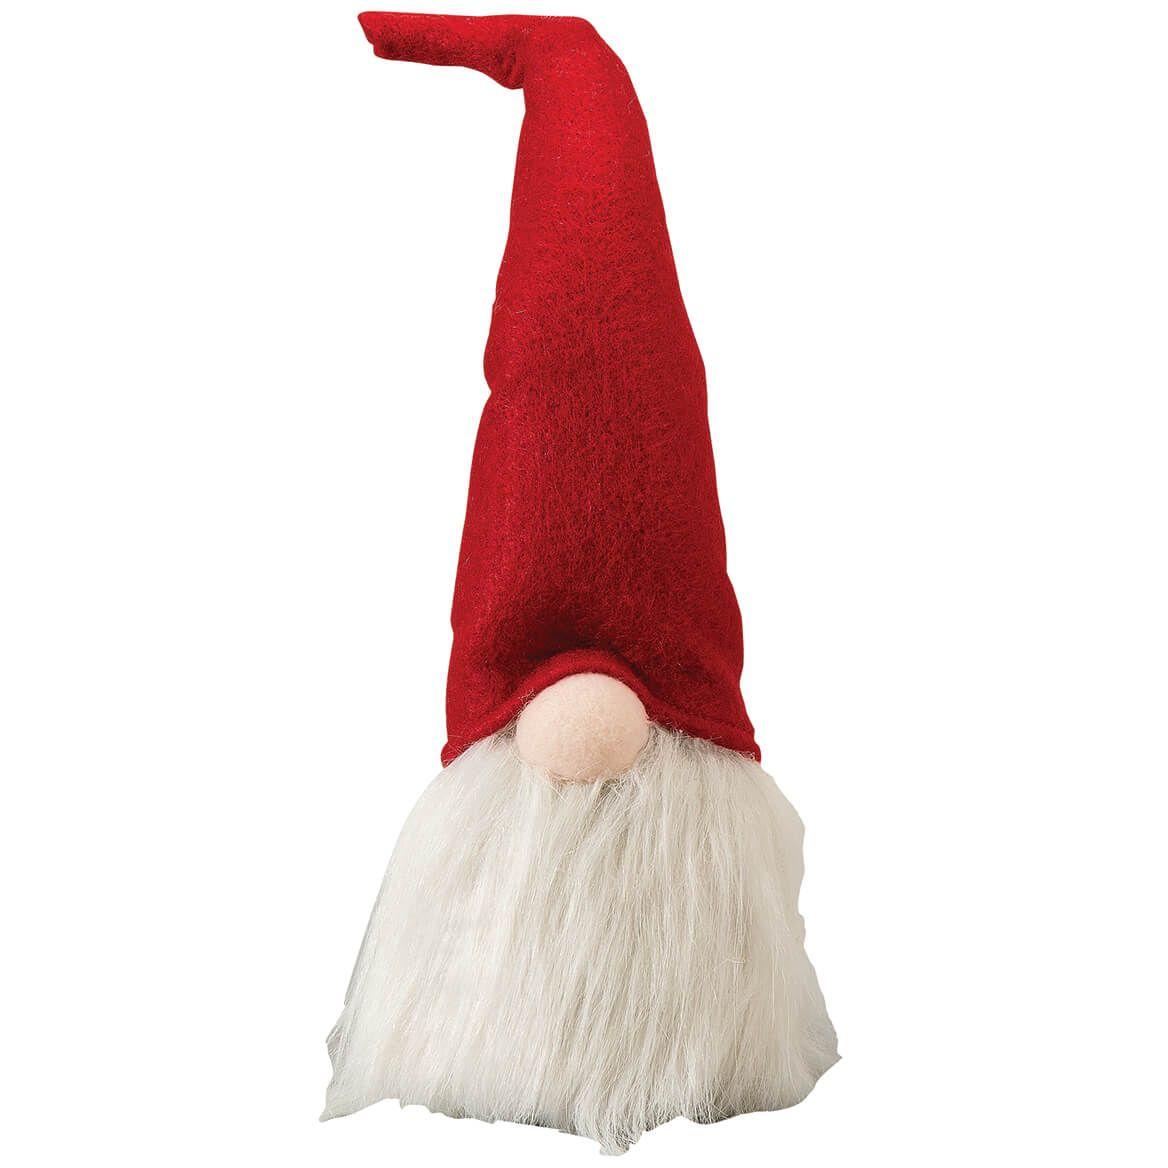 Gnome Shelf Sitter-371996